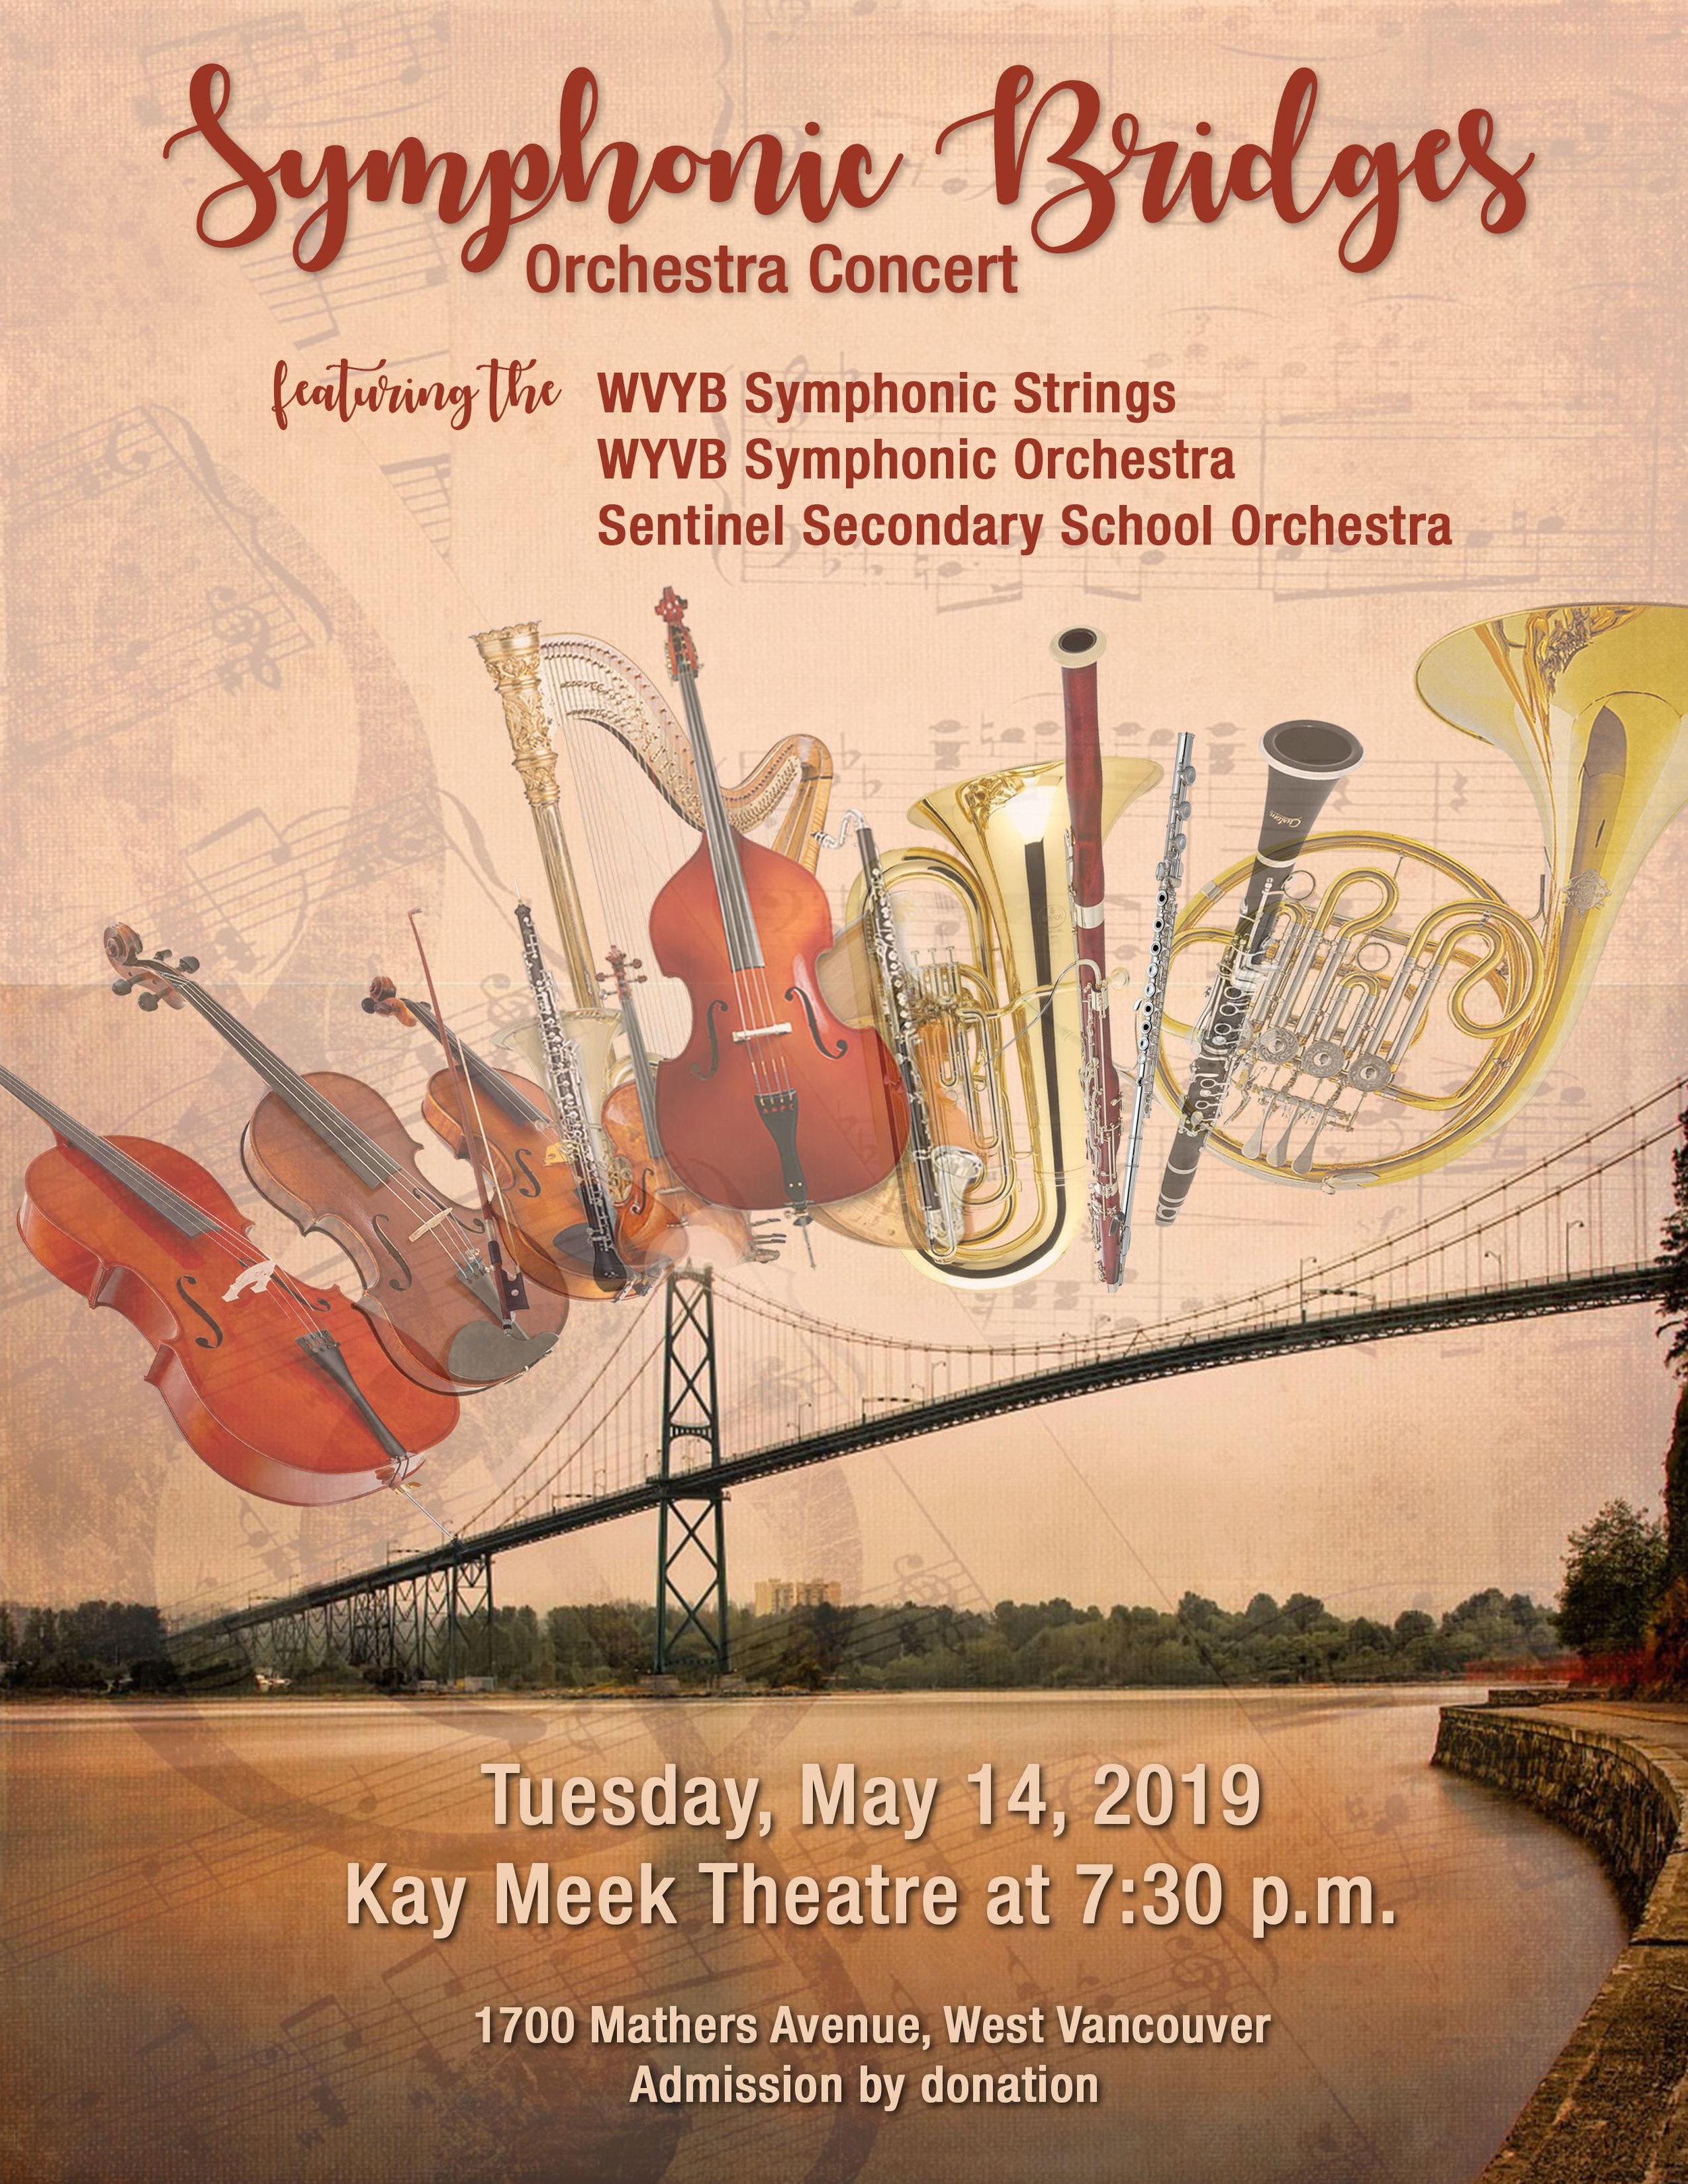 Orchestra 2019 Symphony Final-Final jpg.jpg